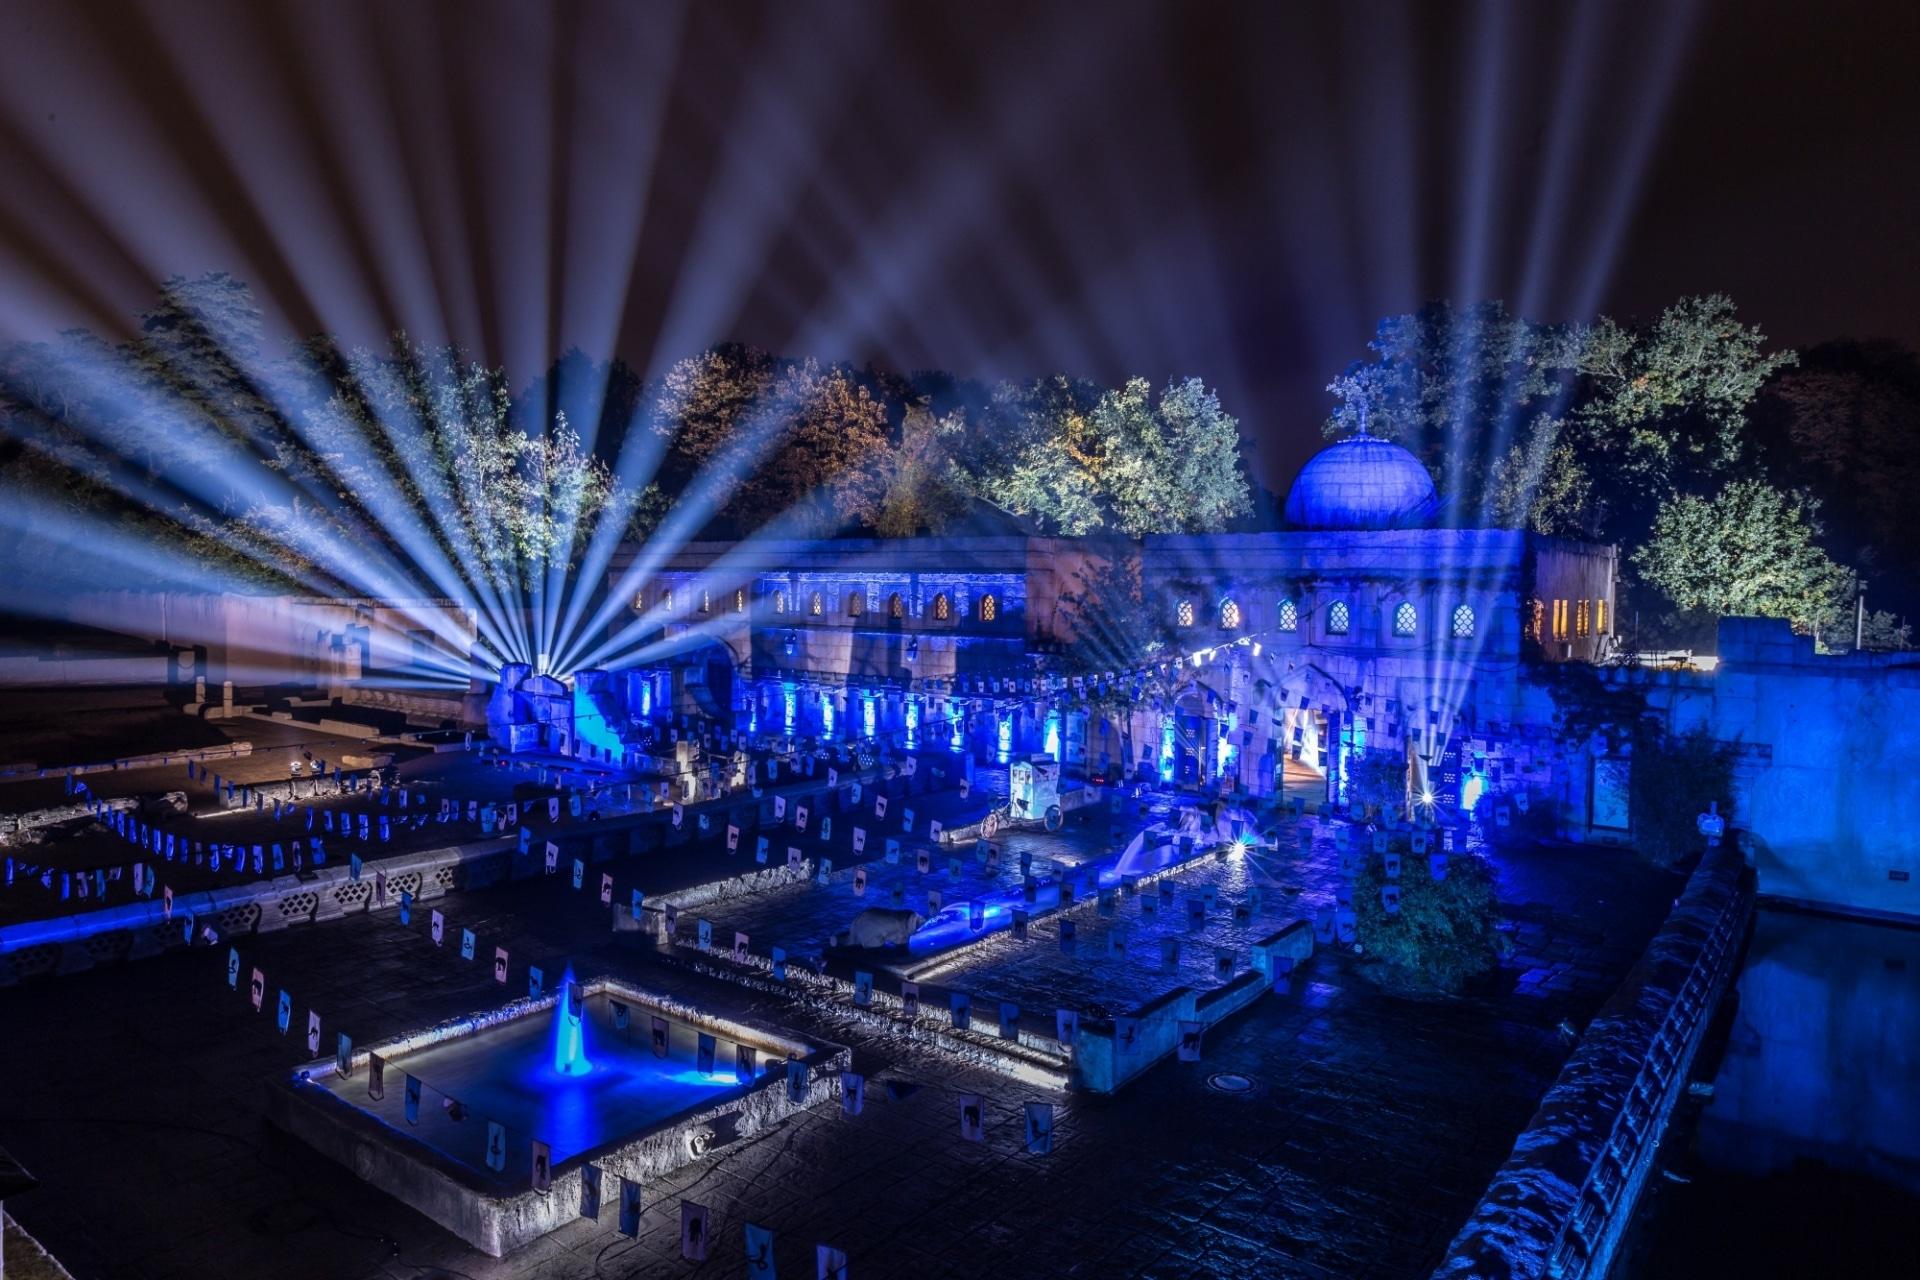 illumination-erlebnis-zoo-hannover-1